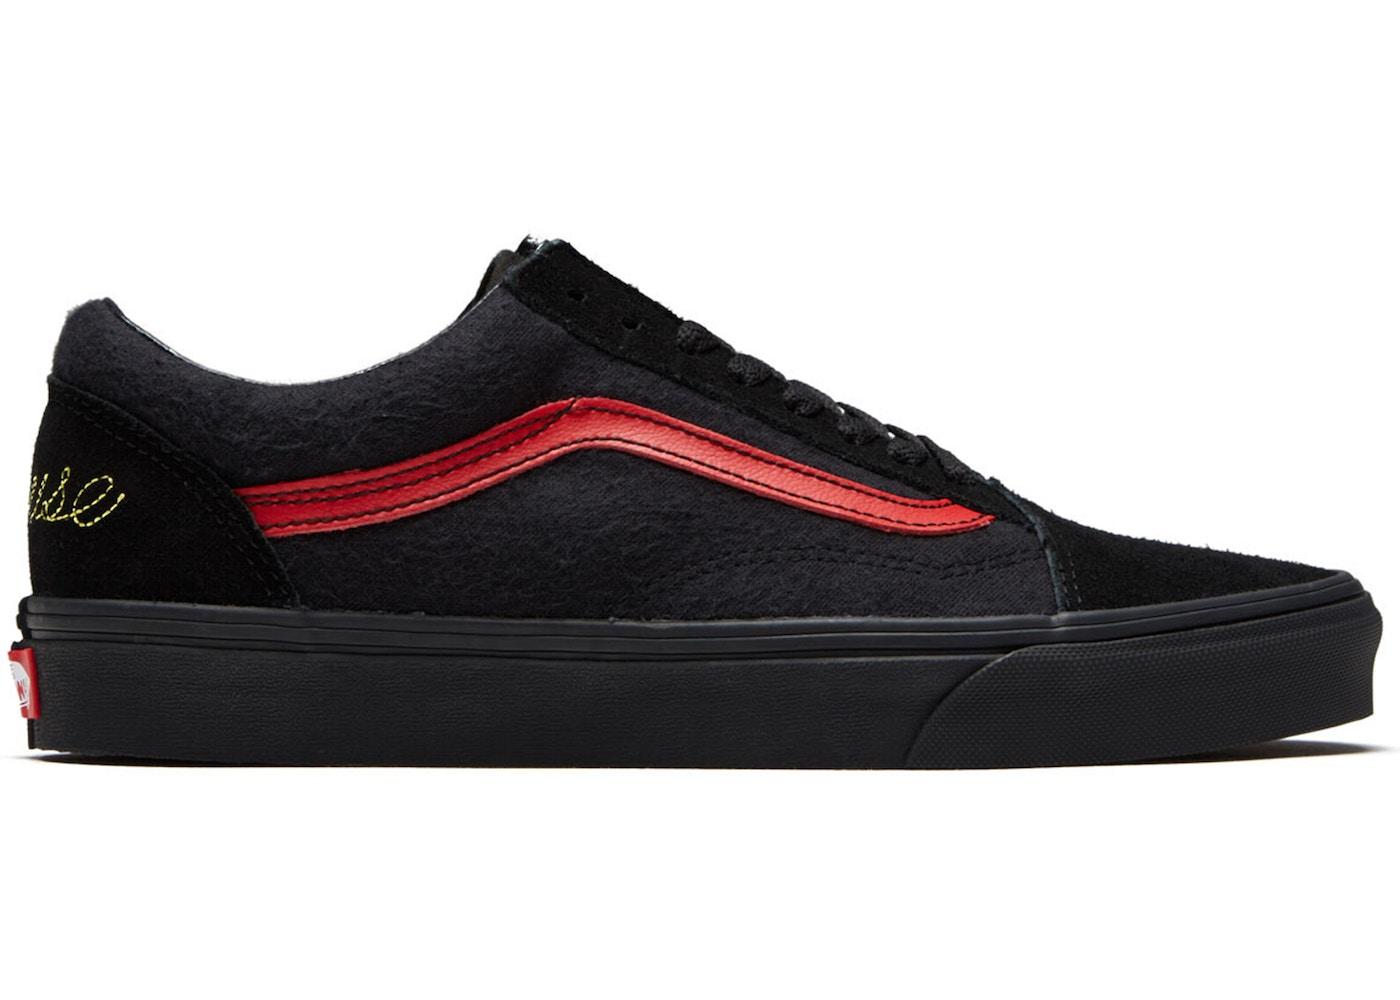 b3c7c005f55 Size 6 Footwear - New Lowest Asks